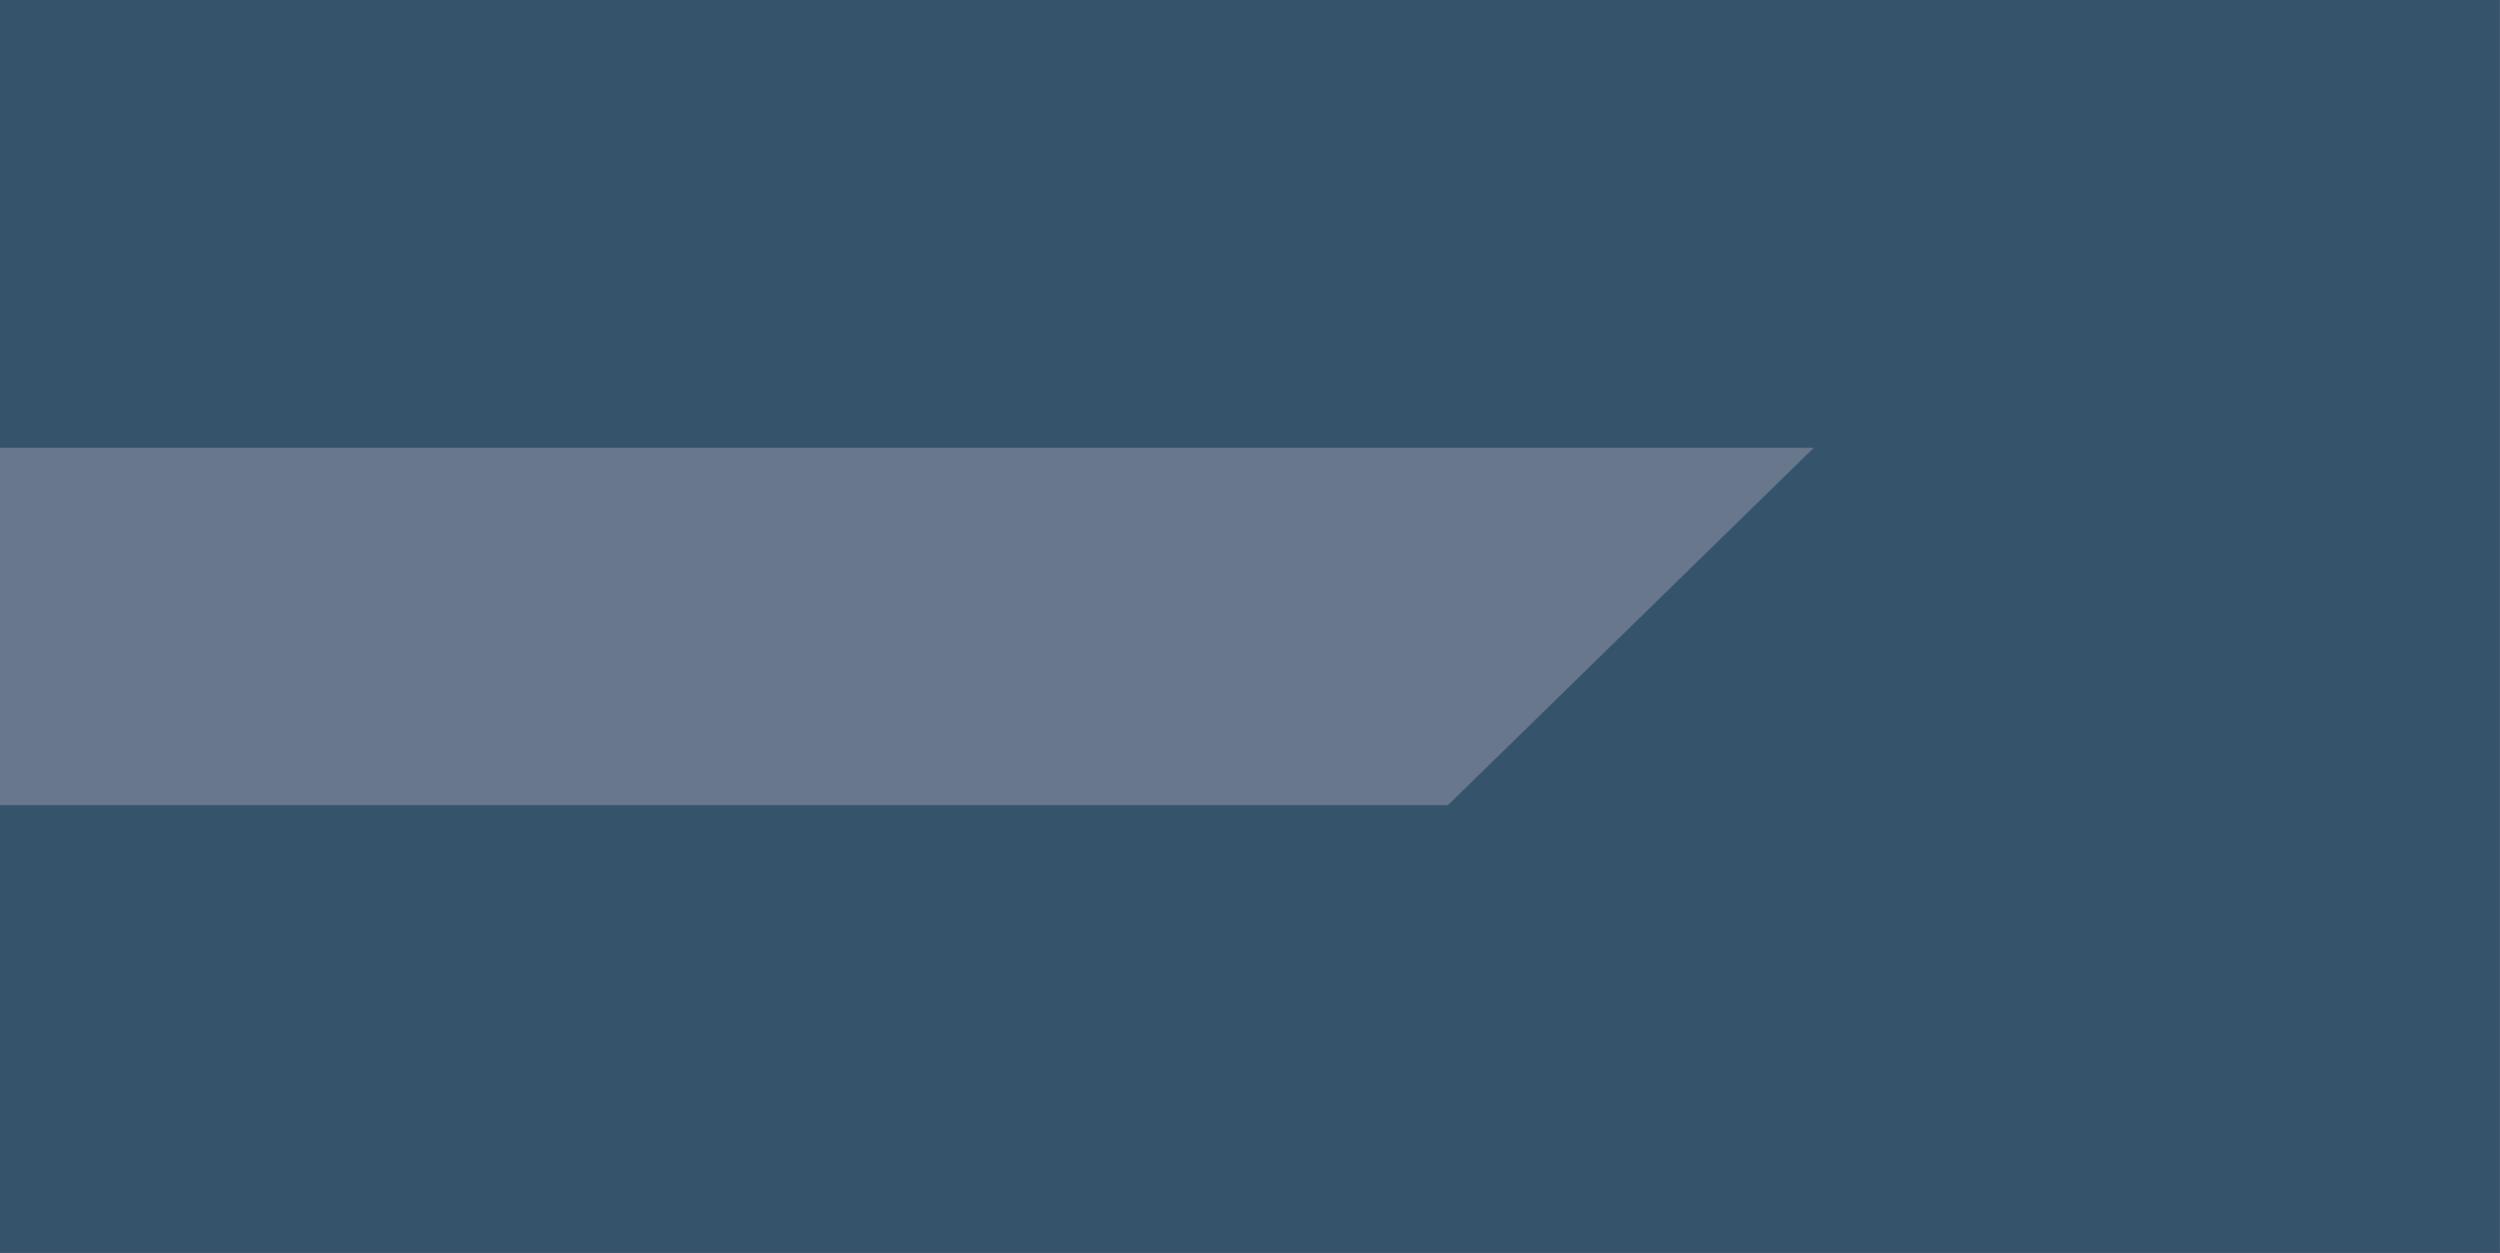 Form background (1)-min.png